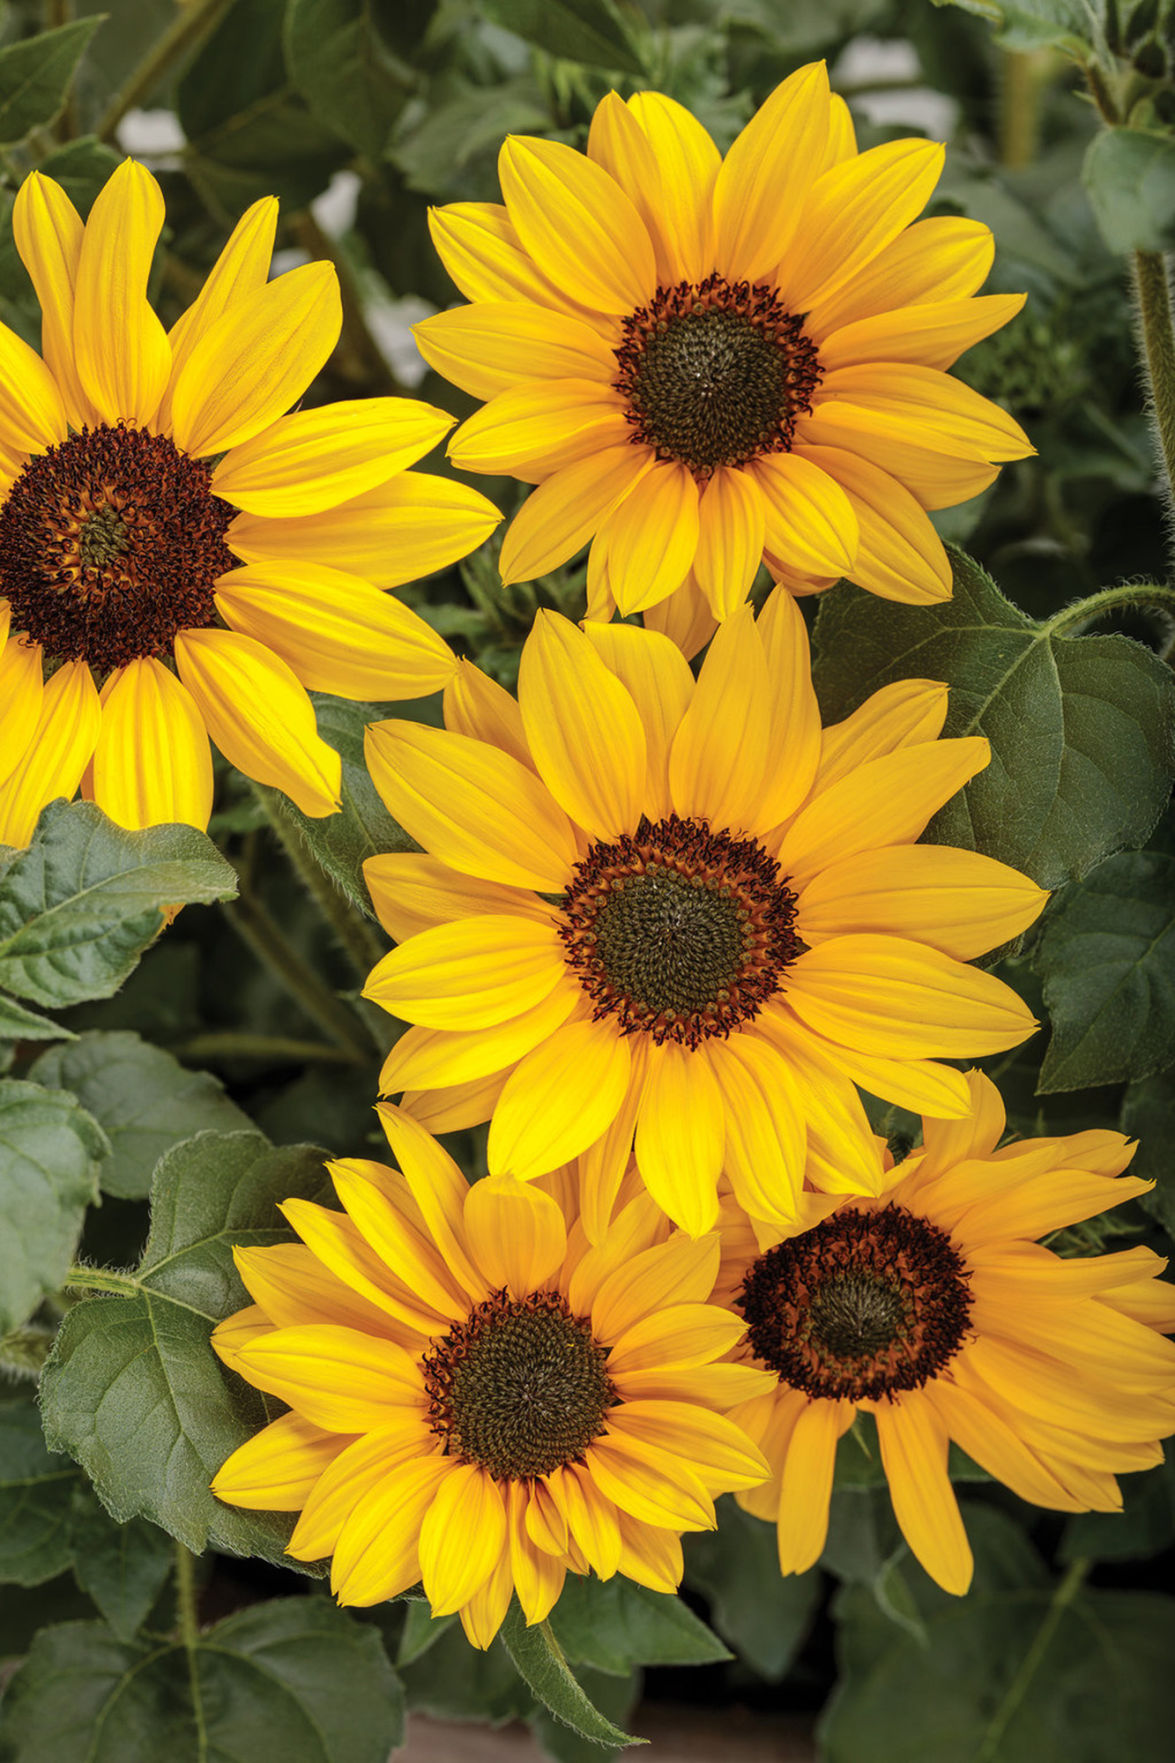 Suncredible Yellow an ever-blooming bush sunflower